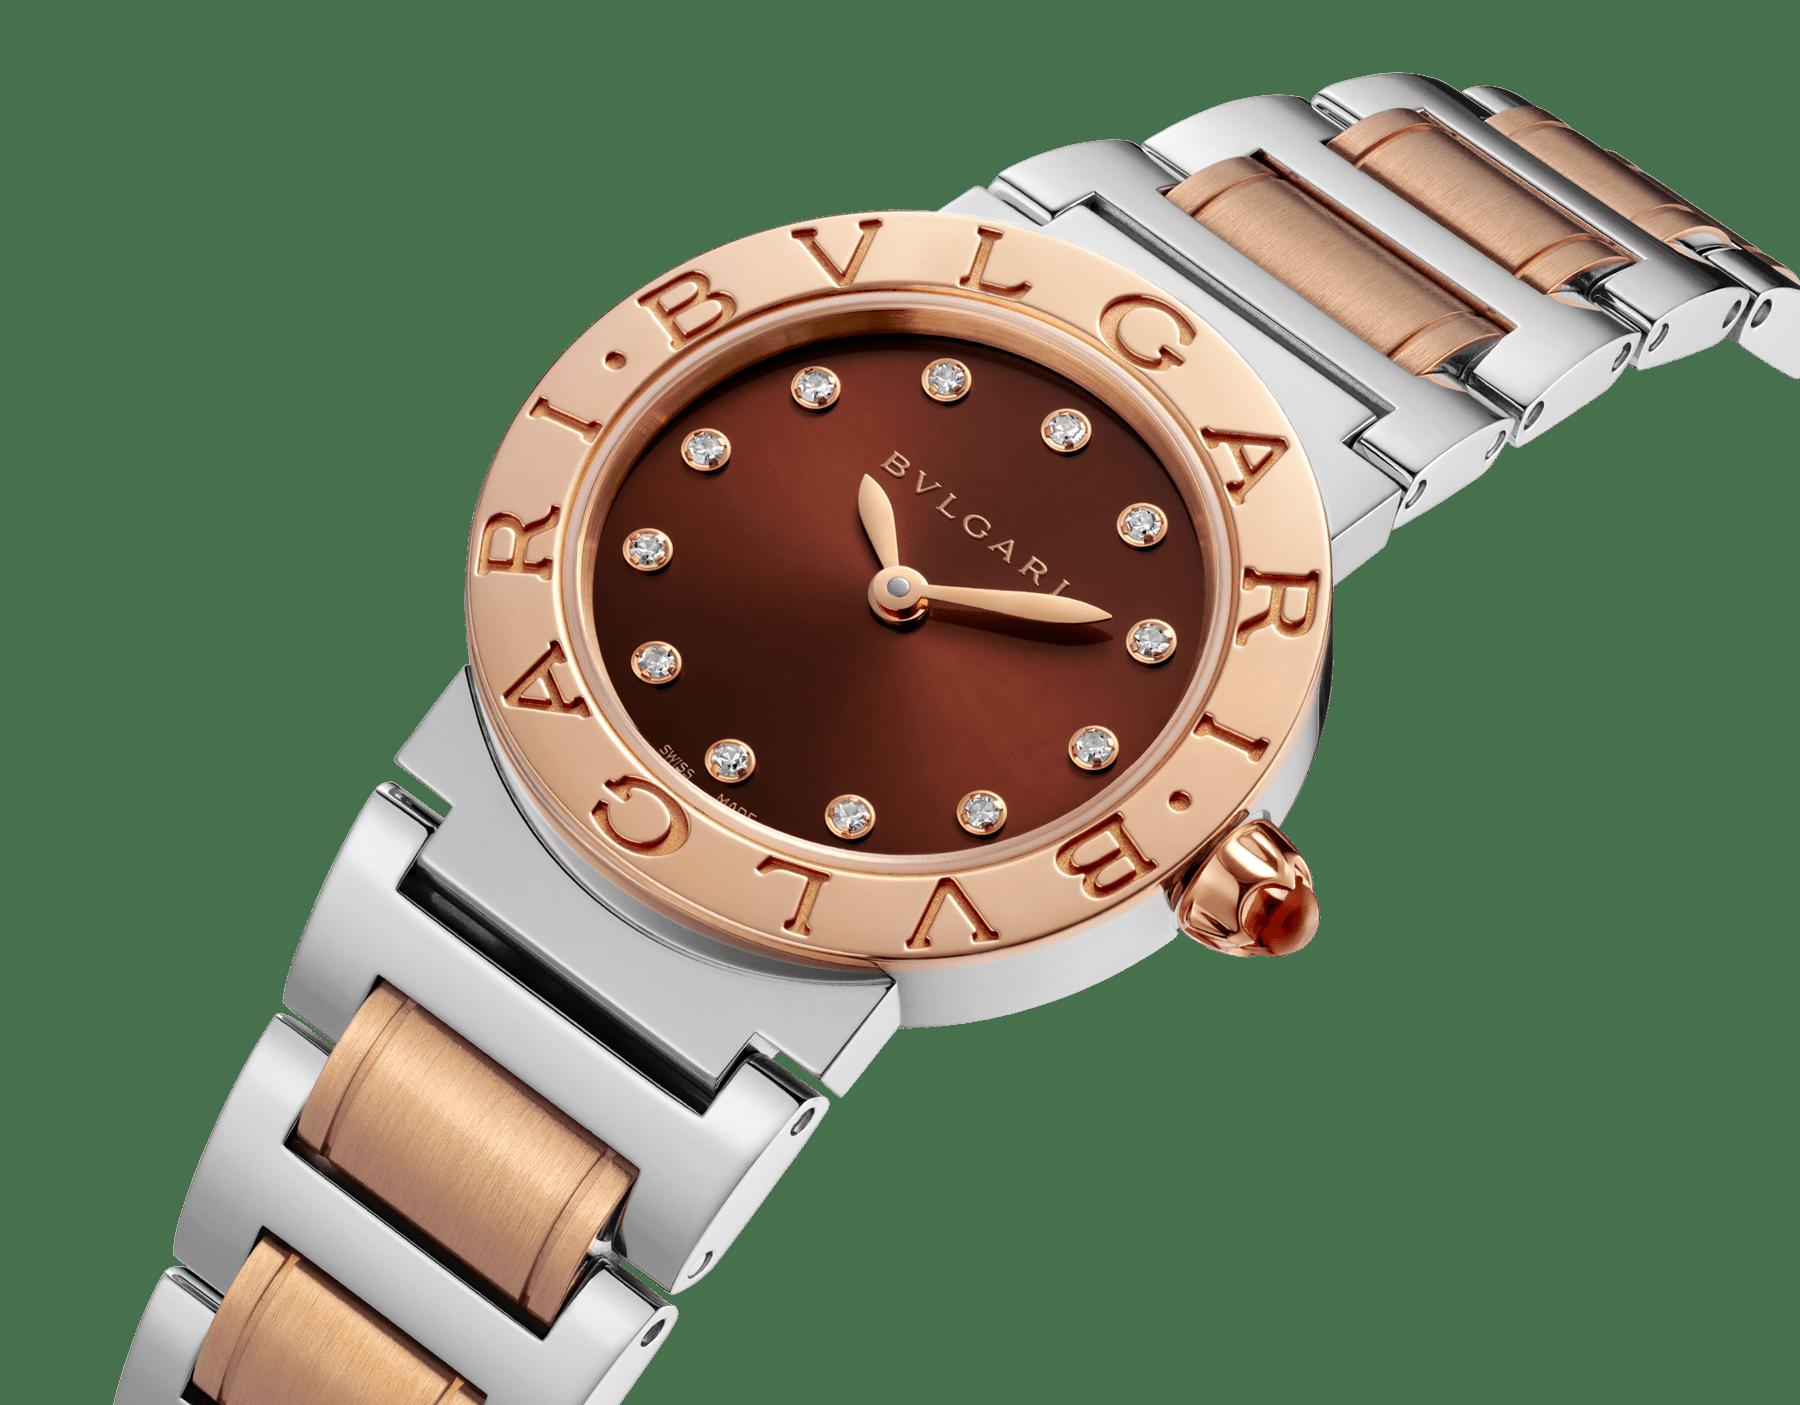 BVLGARI BVLGARI 腕錶,精鋼和 18K 玫瑰金錶殼和錶帶,棕色太陽紋漆面錶盤,鑽石時標。S 尺寸。 102155 image 2